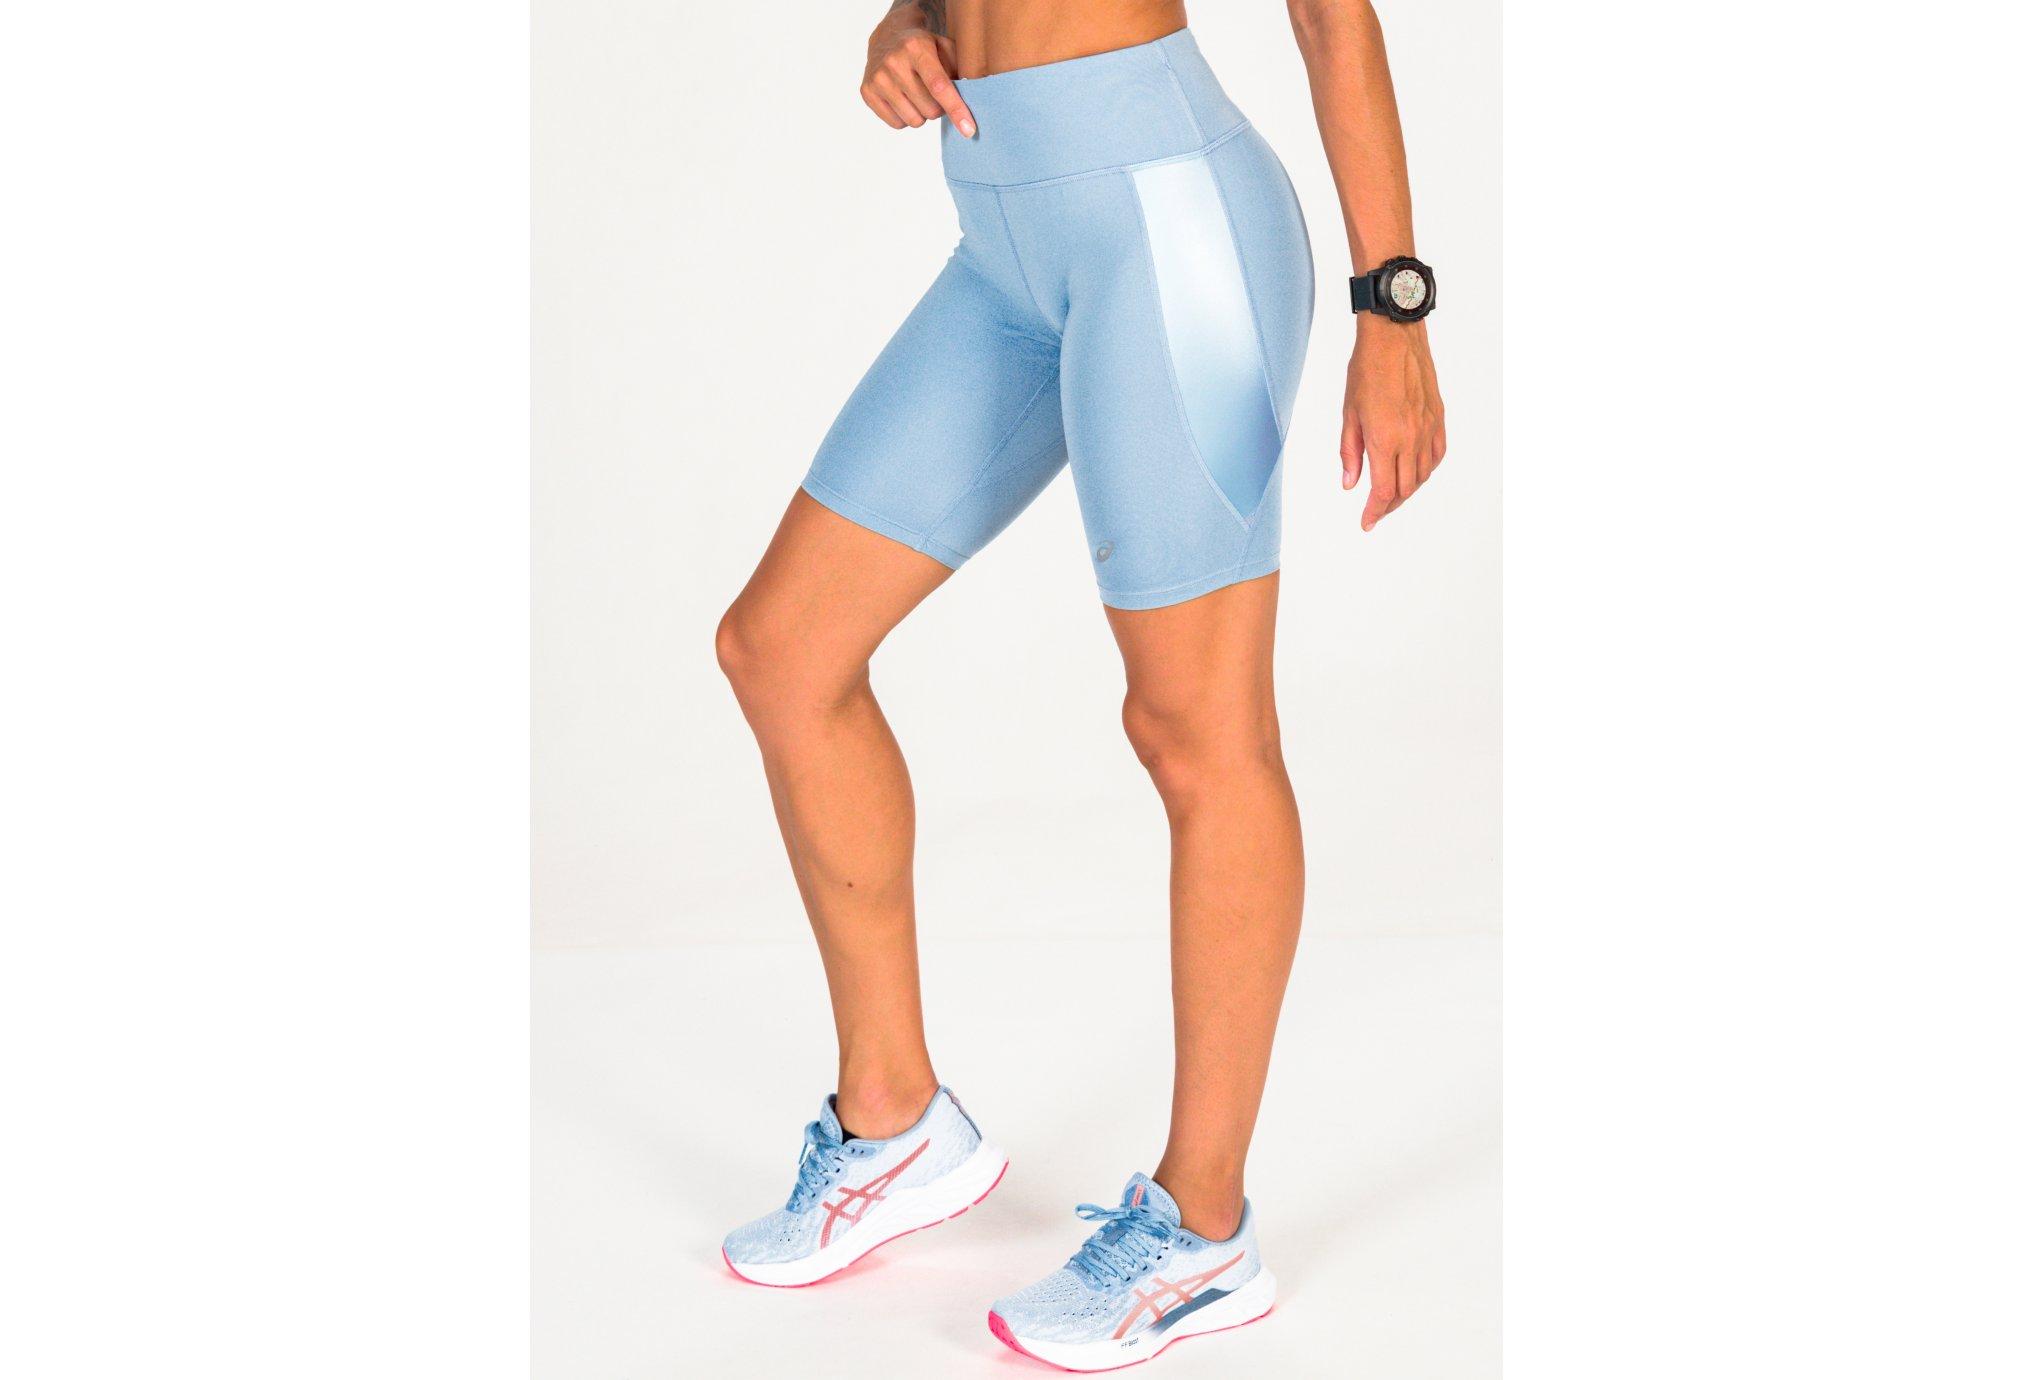 Asics Kasane Sprinter W vêtement running femme